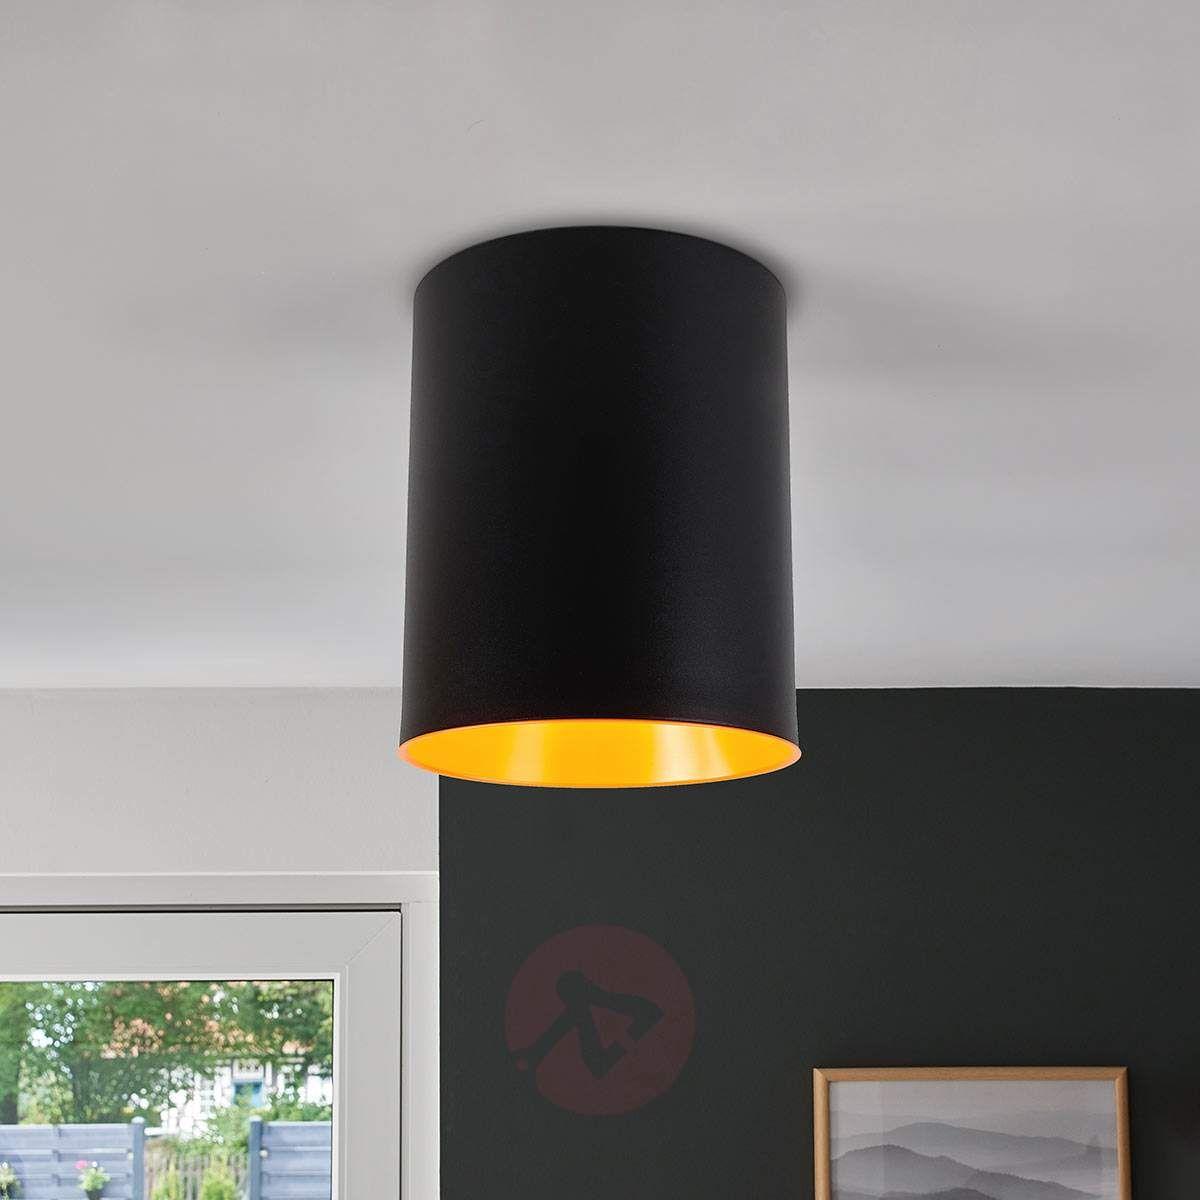 Lampa Sufitowa Led Tagora W Kształcie Cylindra Lampy